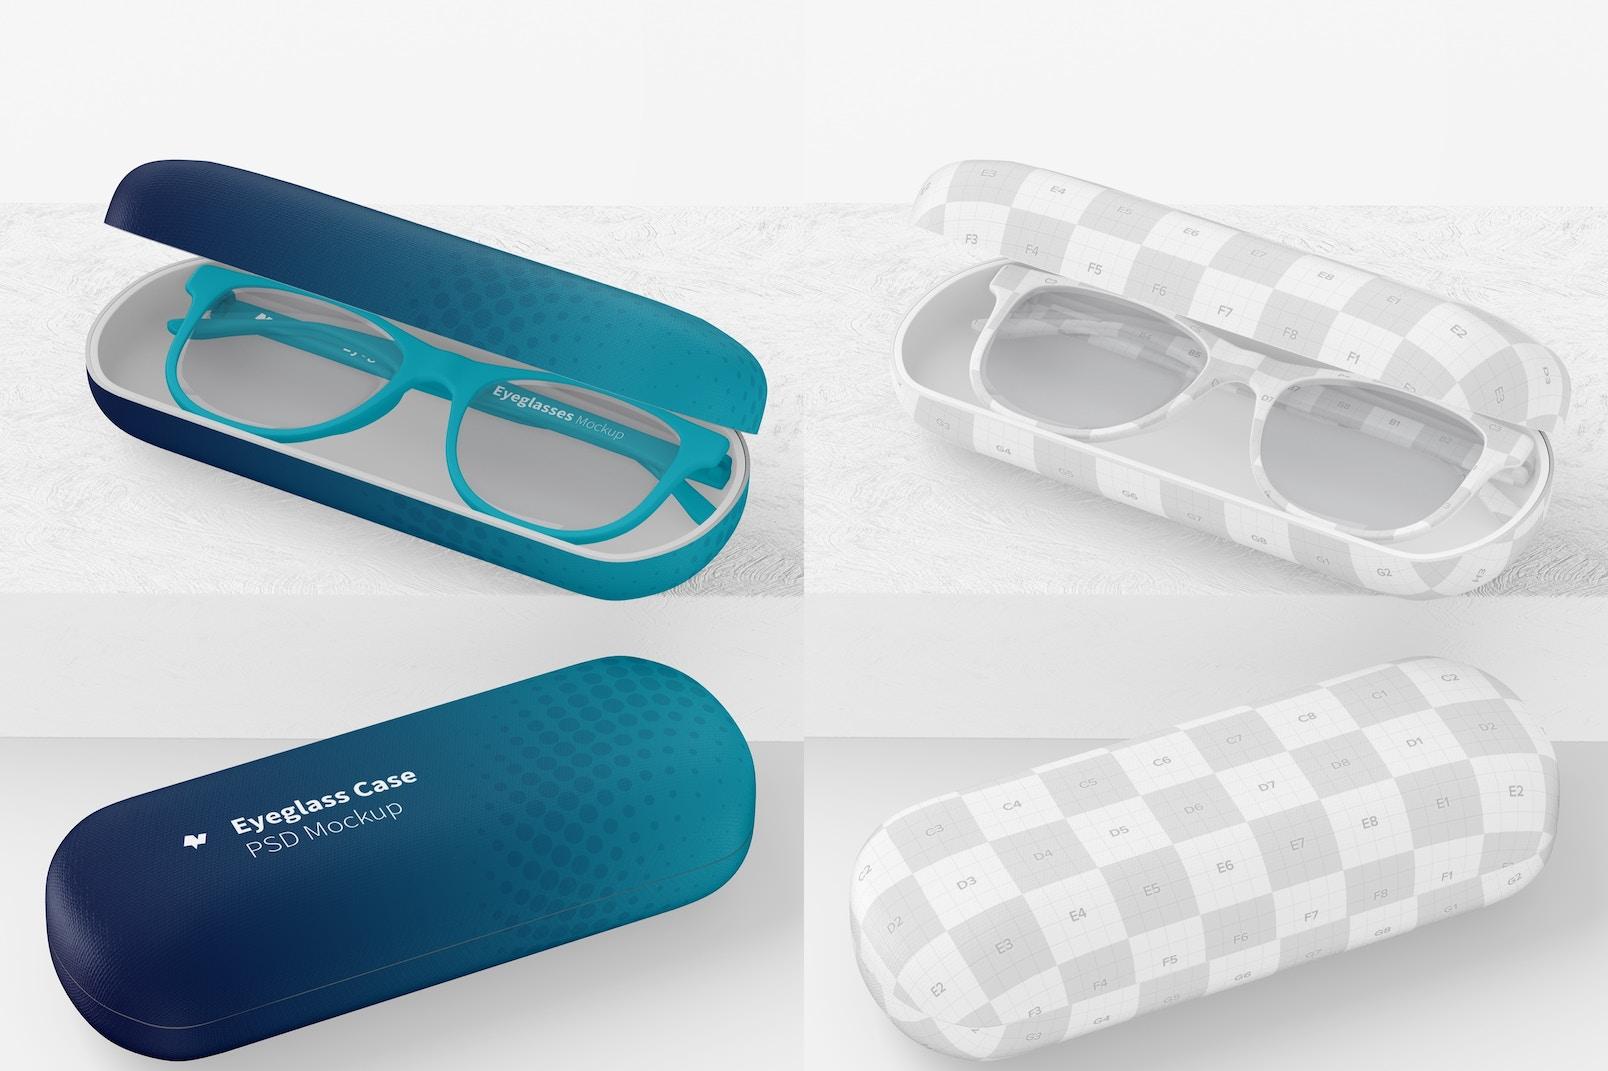 Eyeglass Cases Mockup